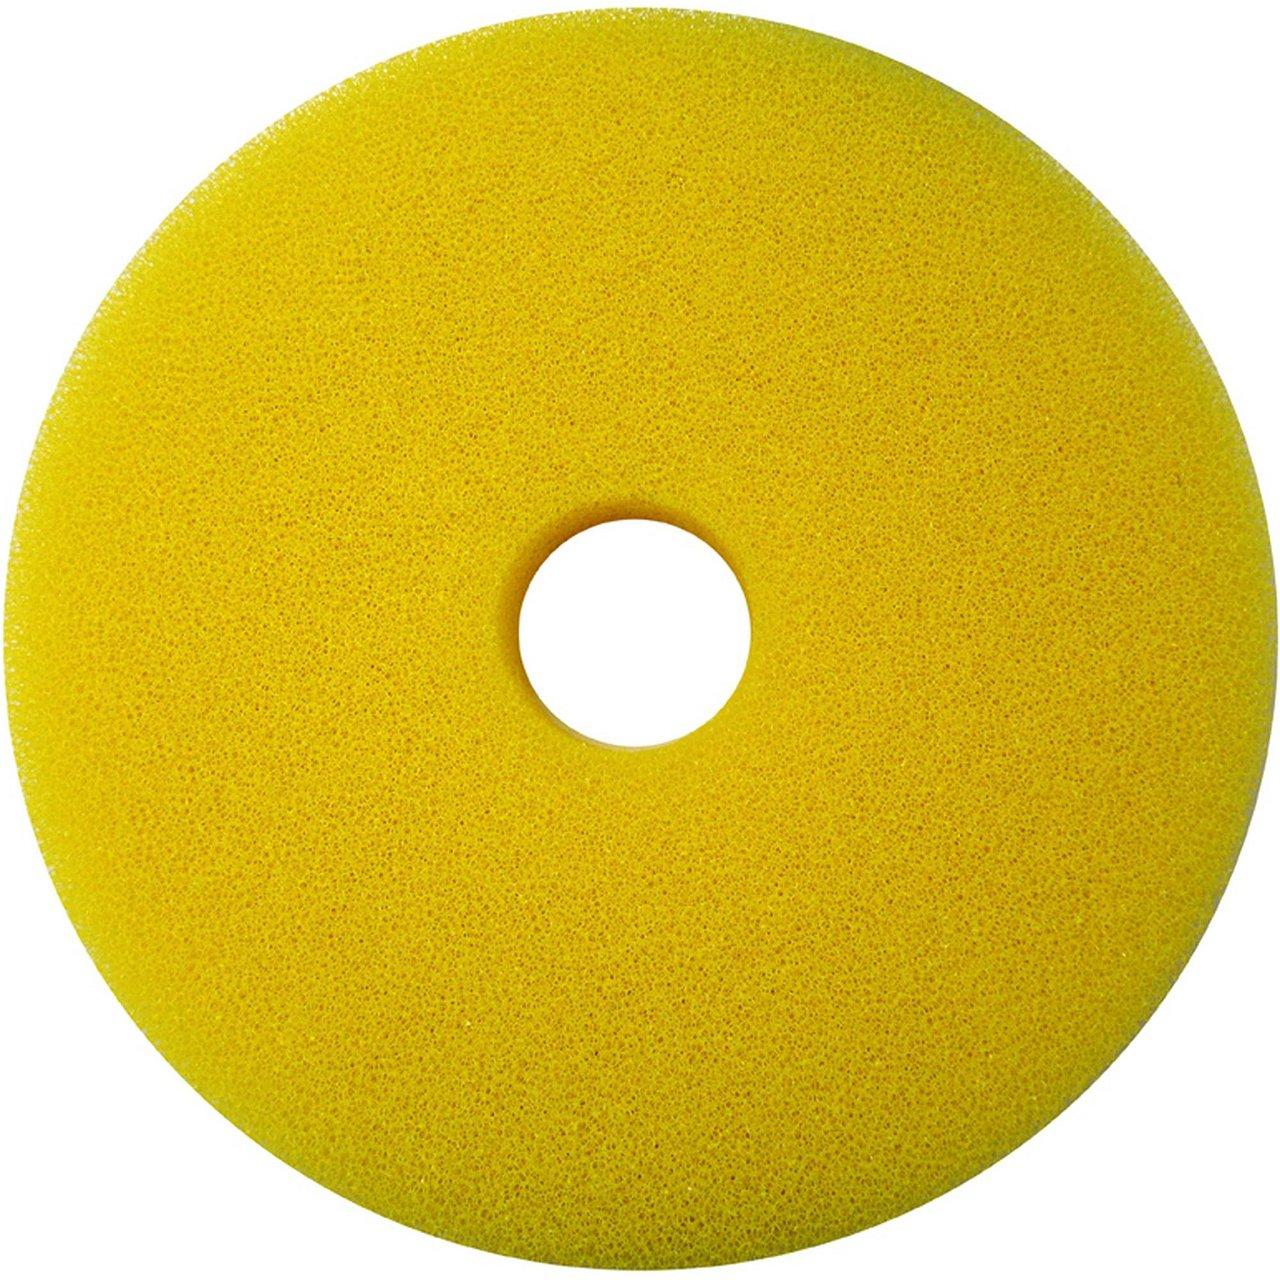 Filtersponge medium/yellow FPU10000-00